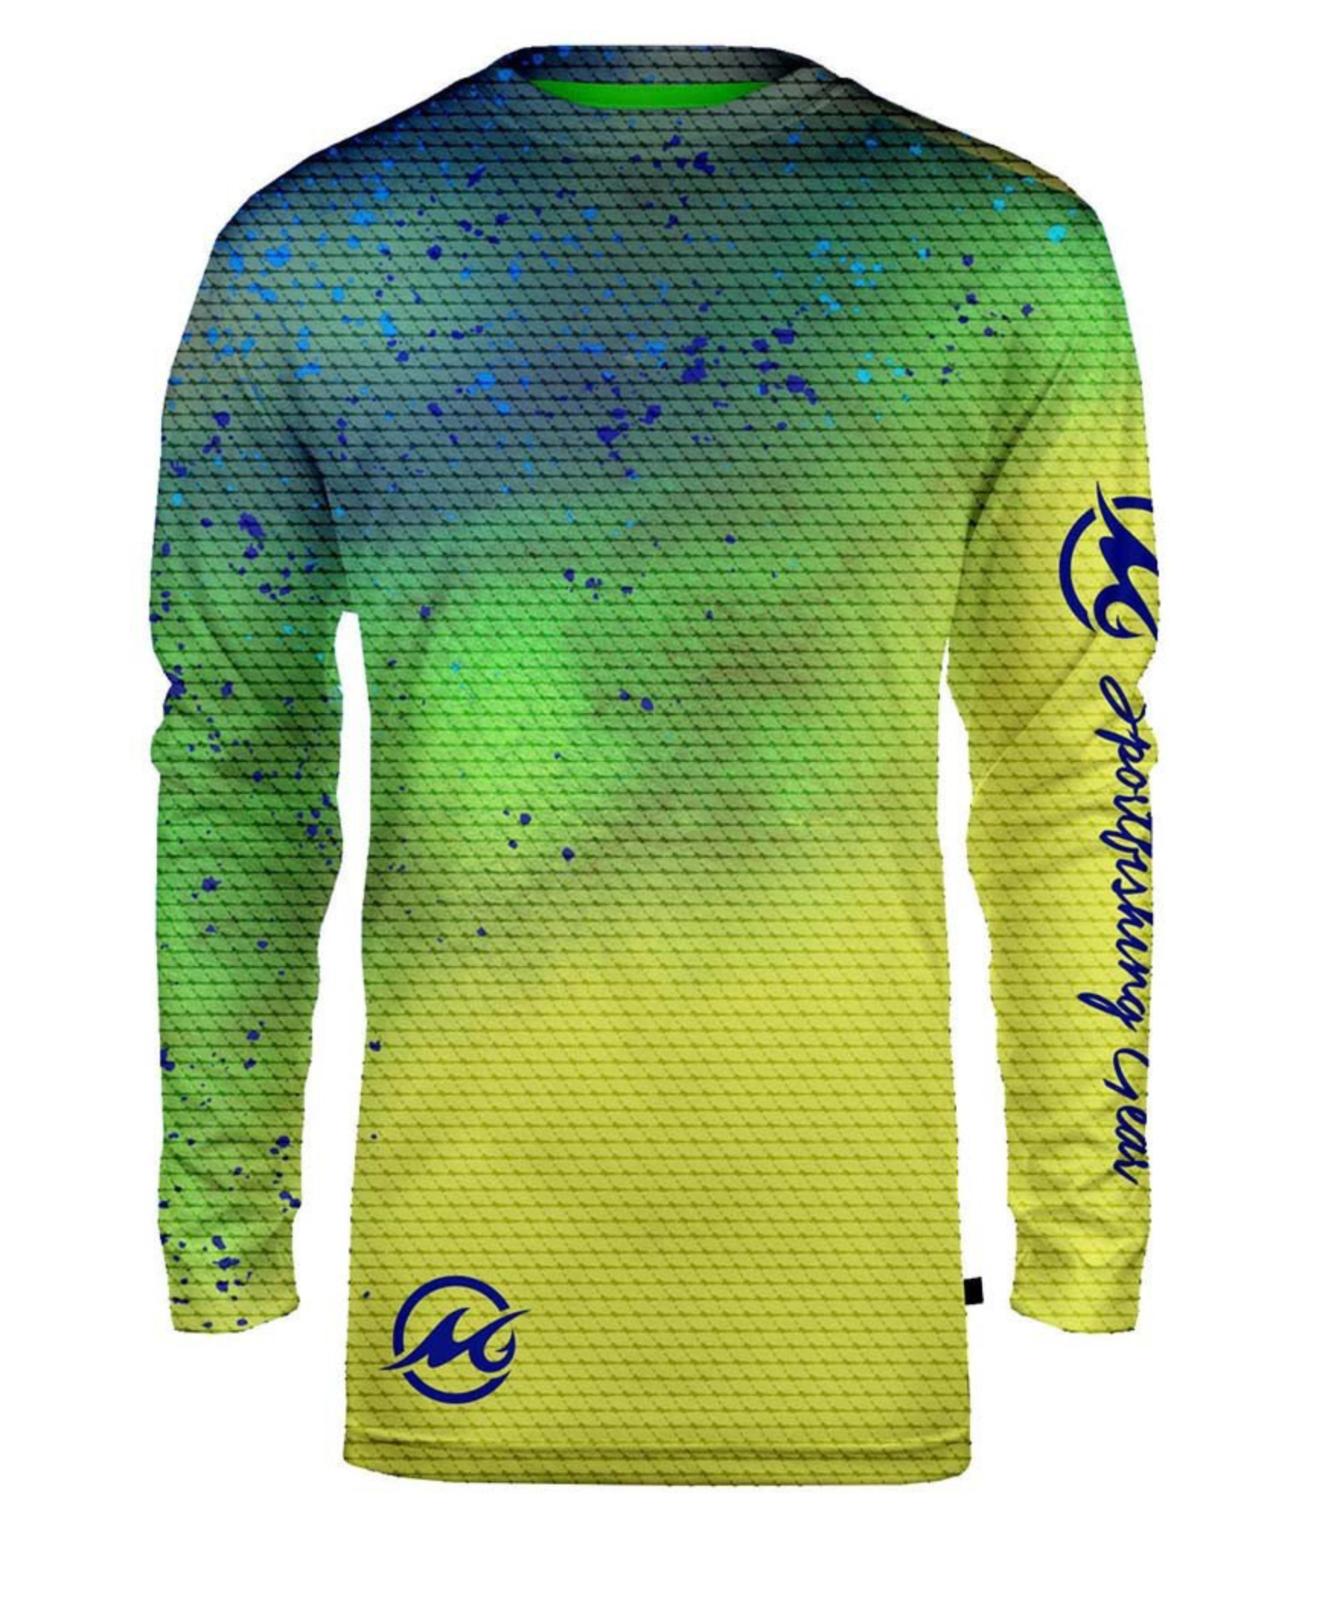 Mojo Sportswear Finny Long Sleeve Sublimated Fishing Boat T-shirt.XS-4XL.Dolphin